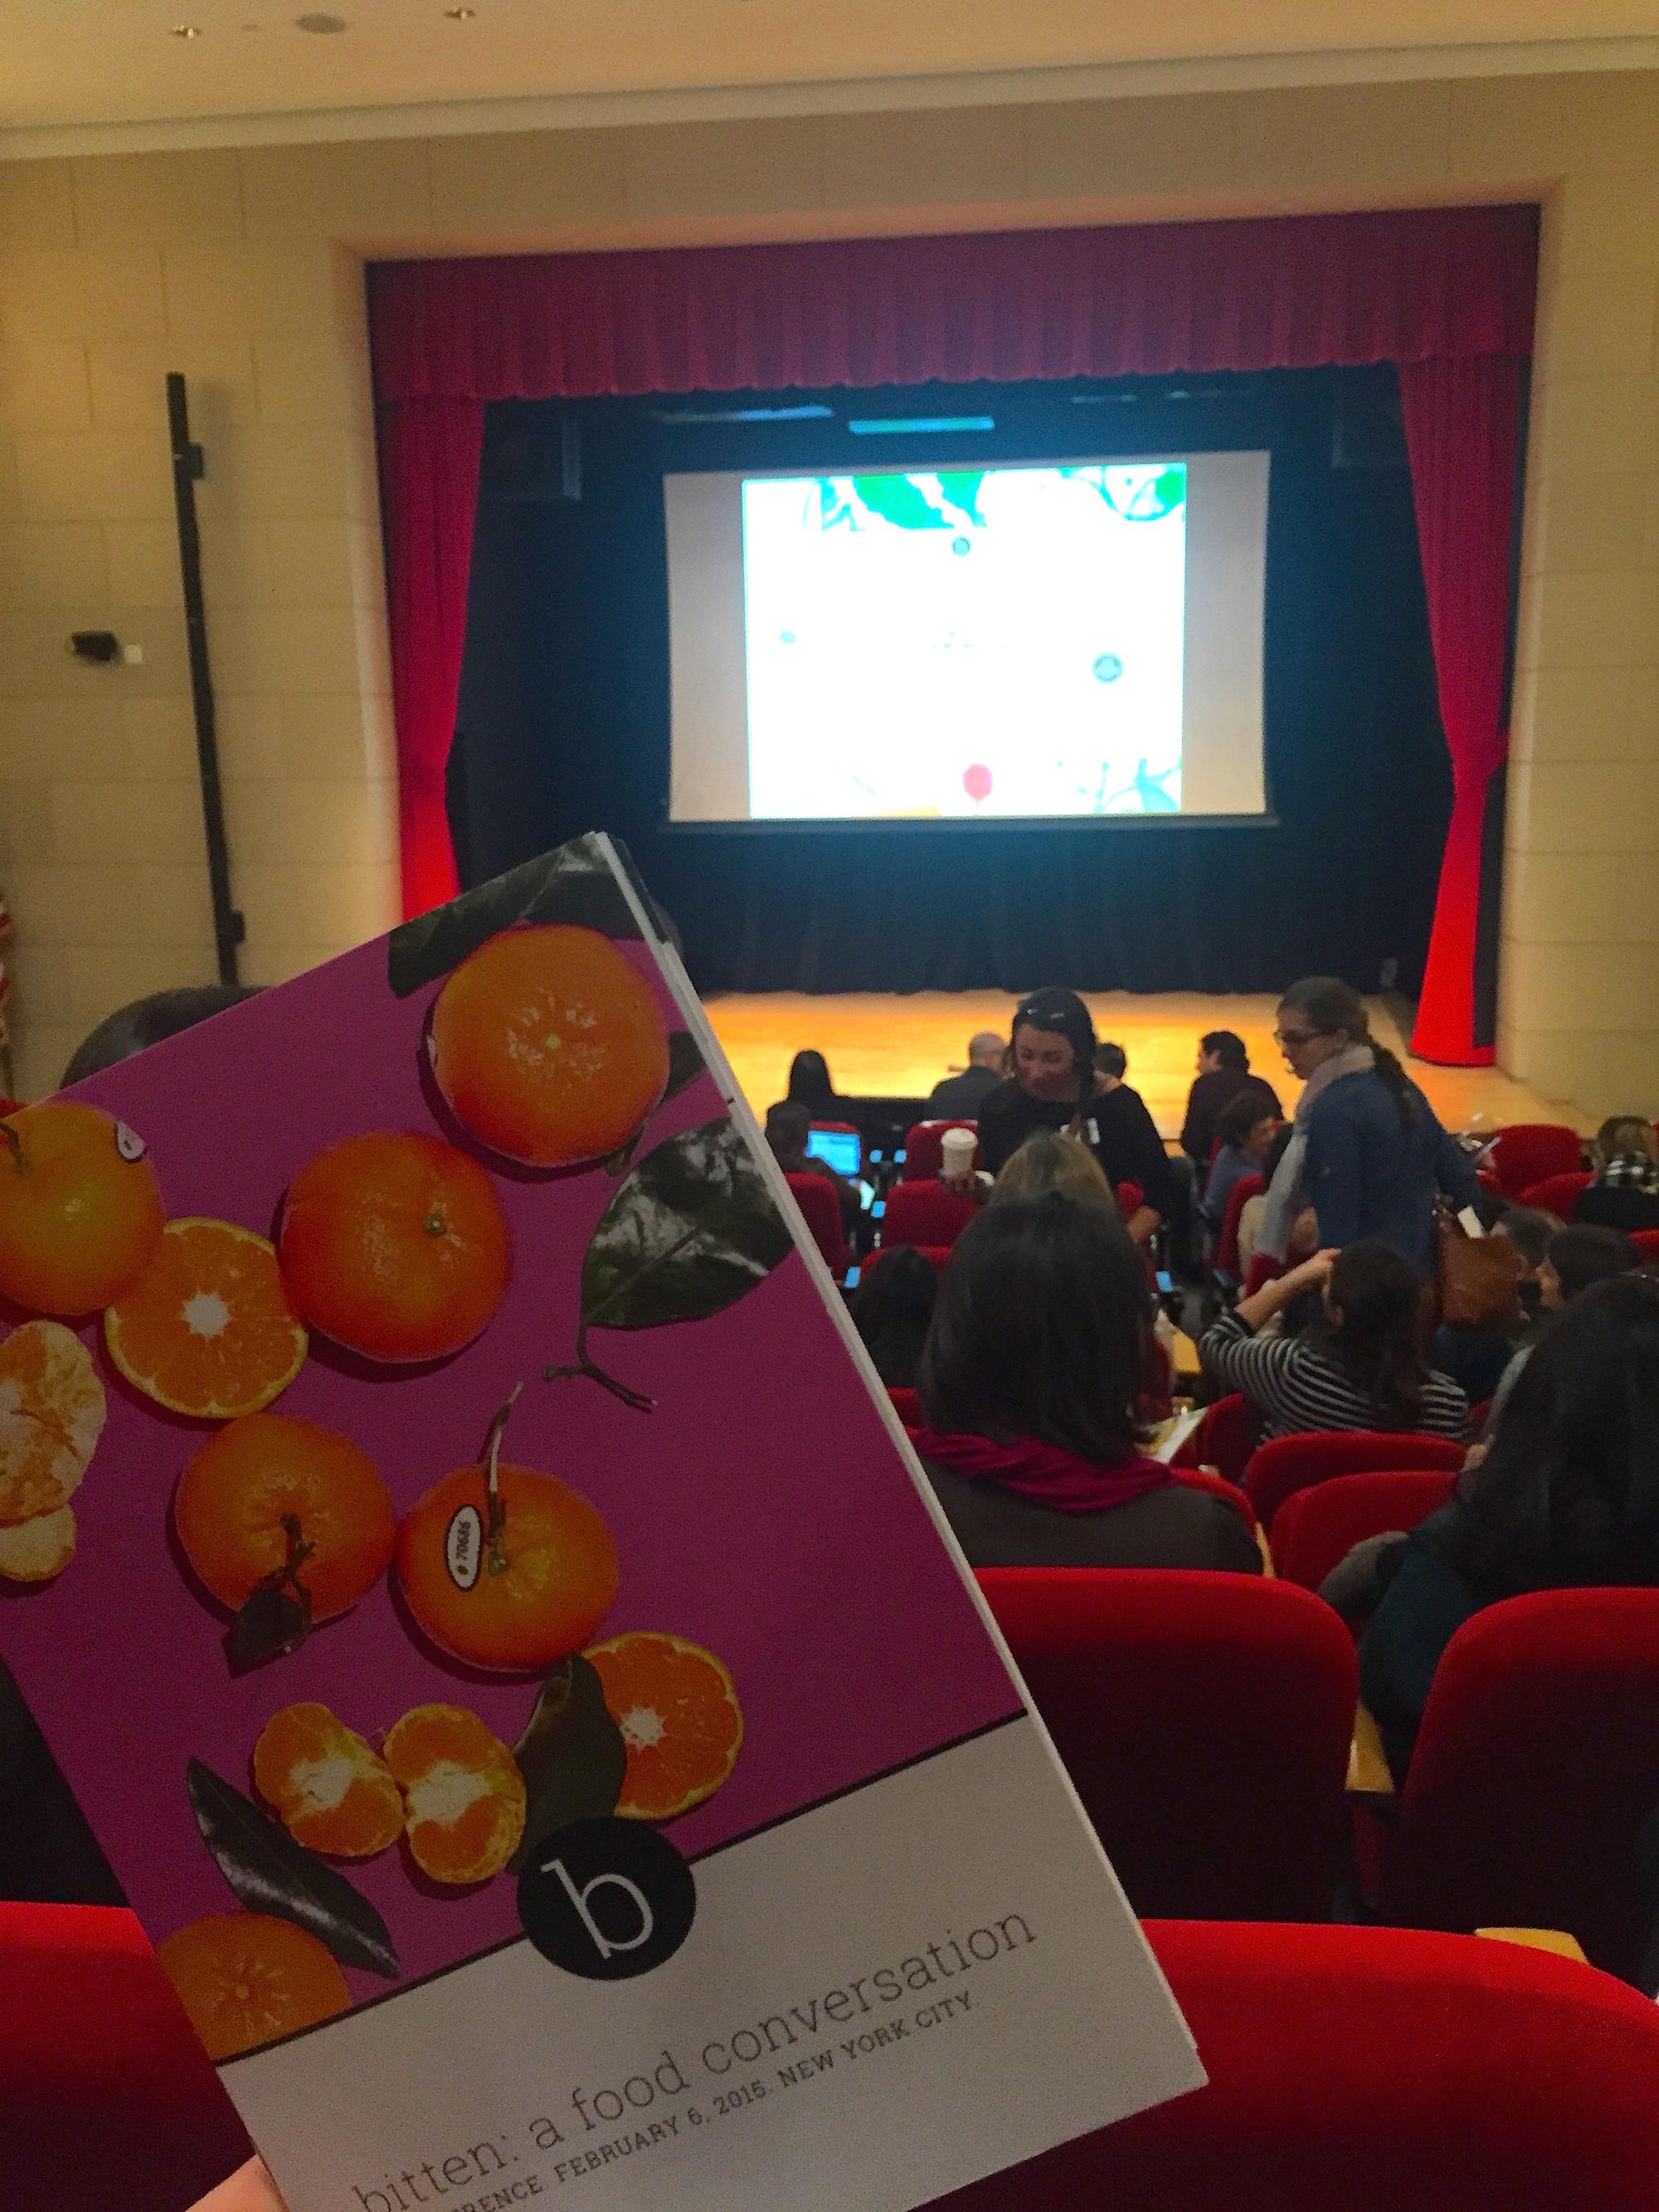 bitten: a food conversation, at Scholastic Auditorium, Feb. 6, 2015